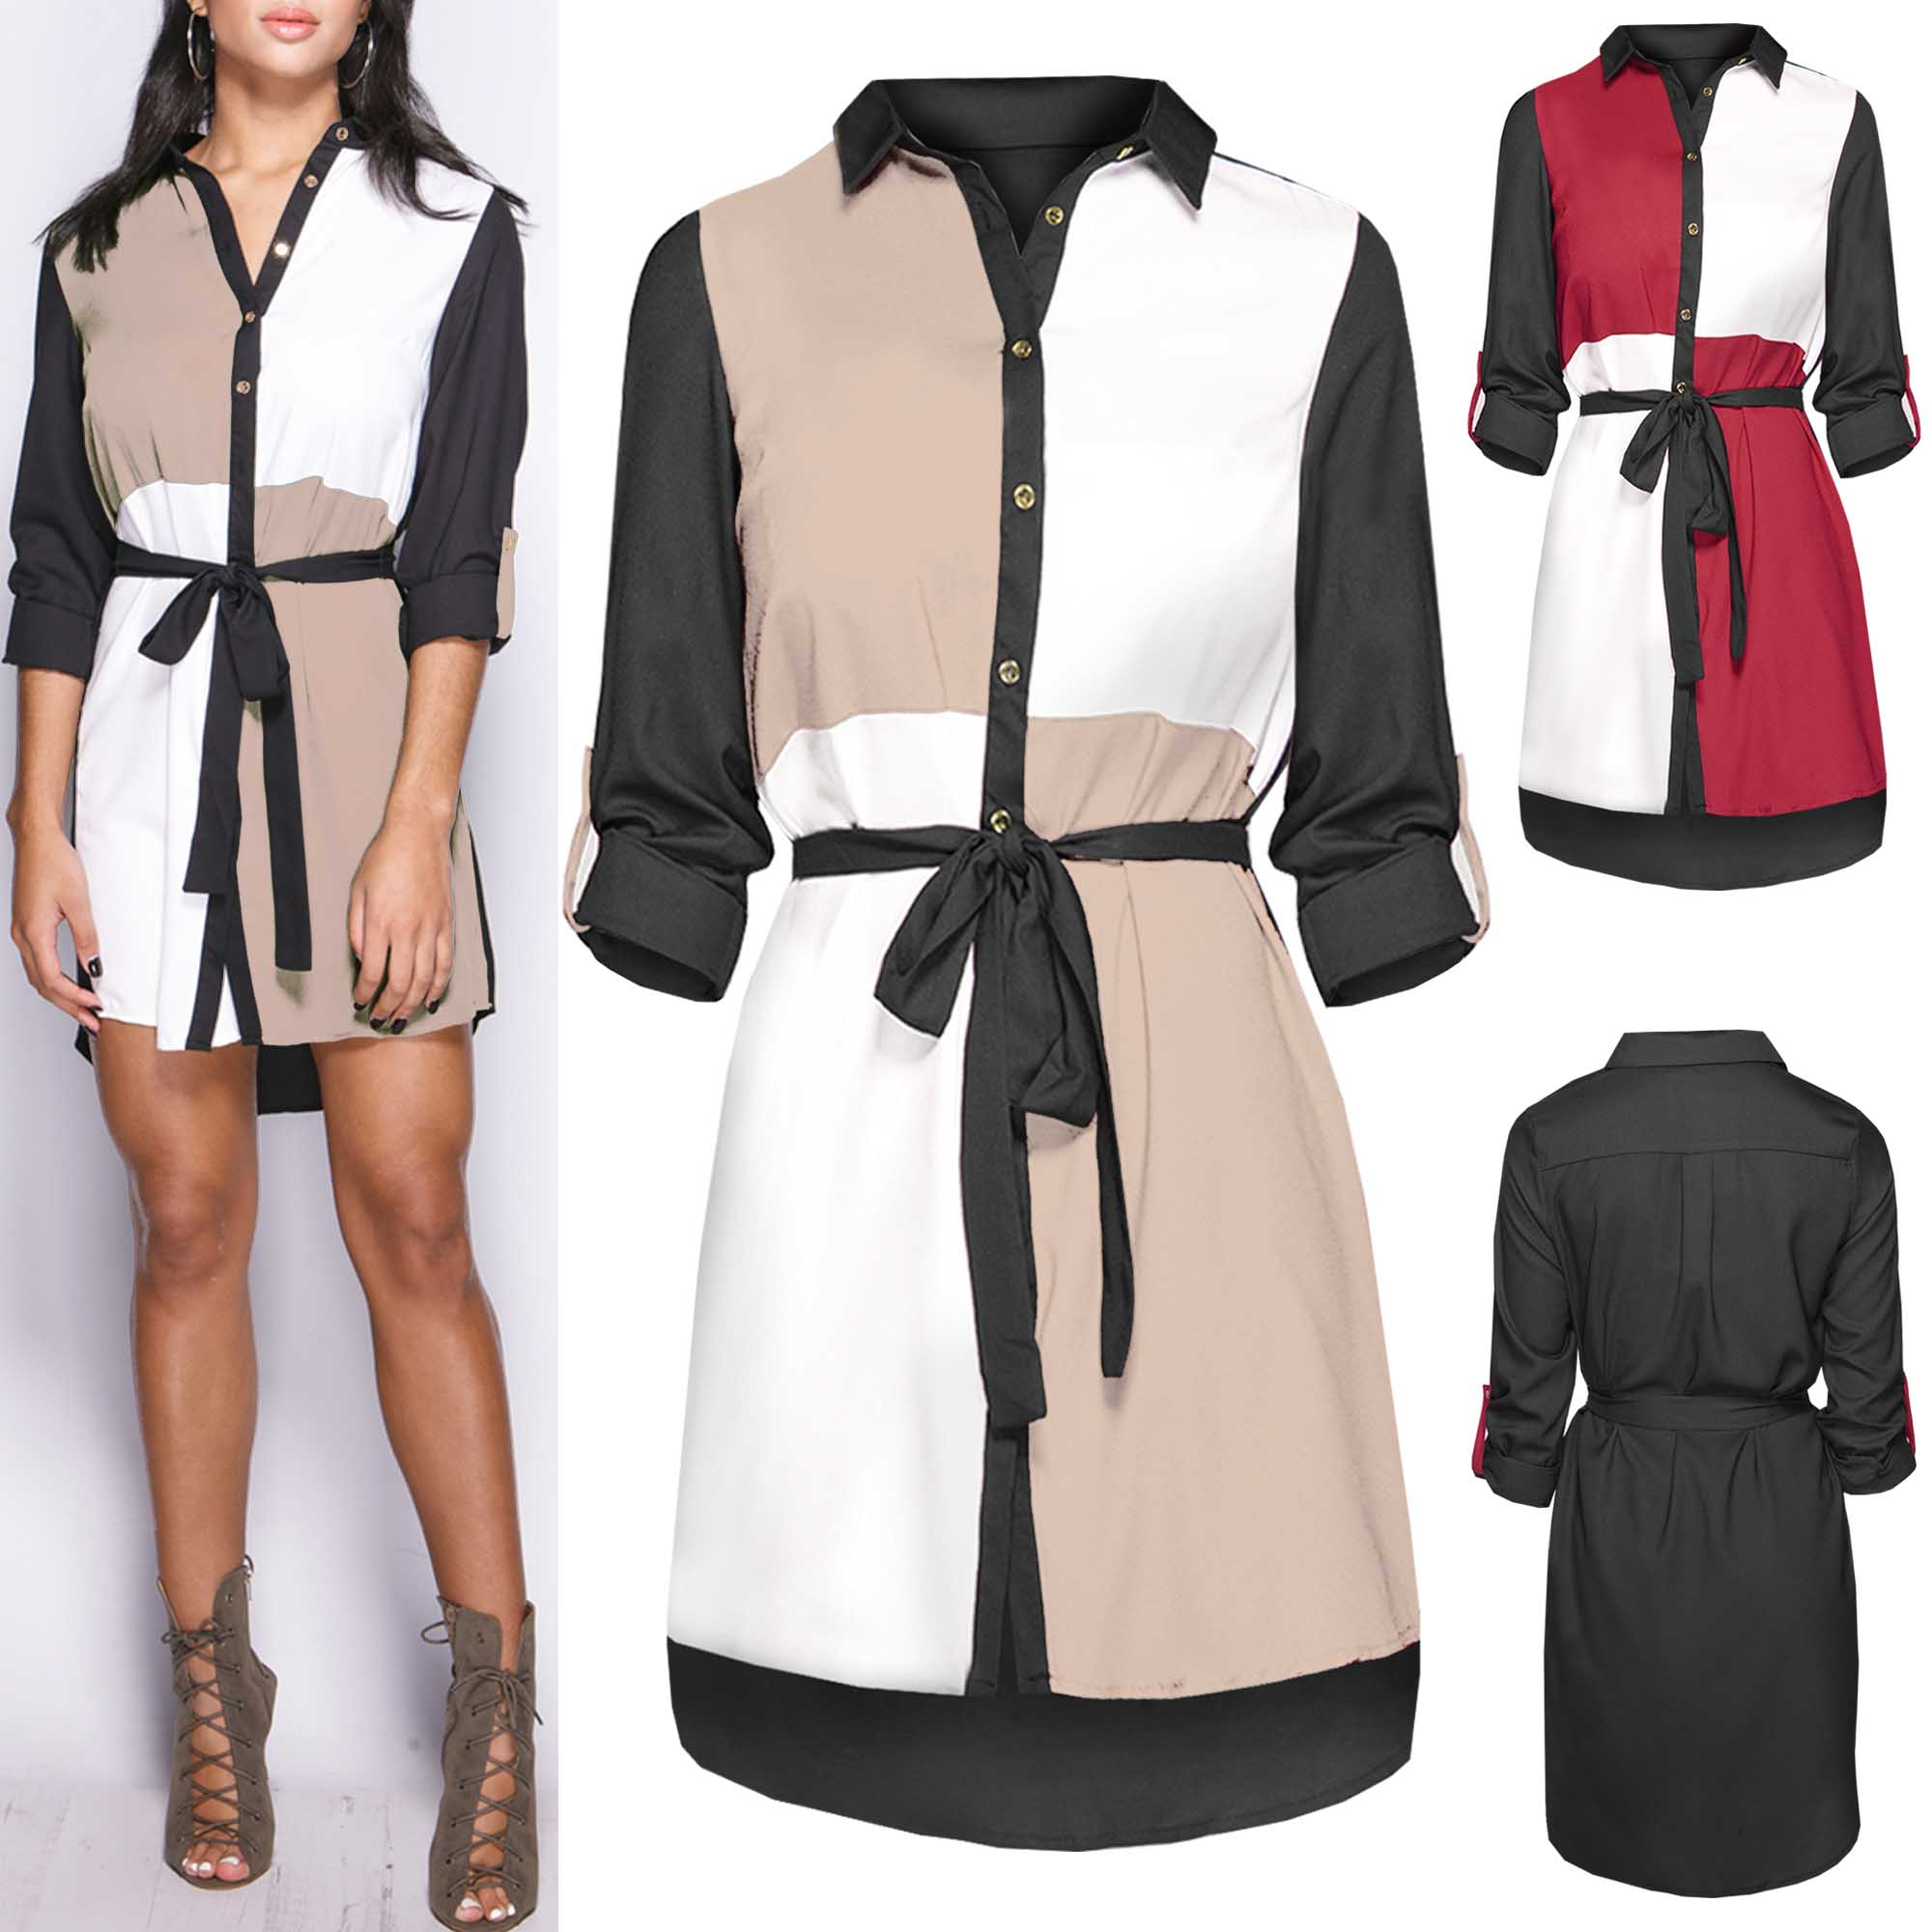 NEW LADIES MULTI COLOUR BLOCK SHIRT DRESS WOMENS LONG SLEEVED ...